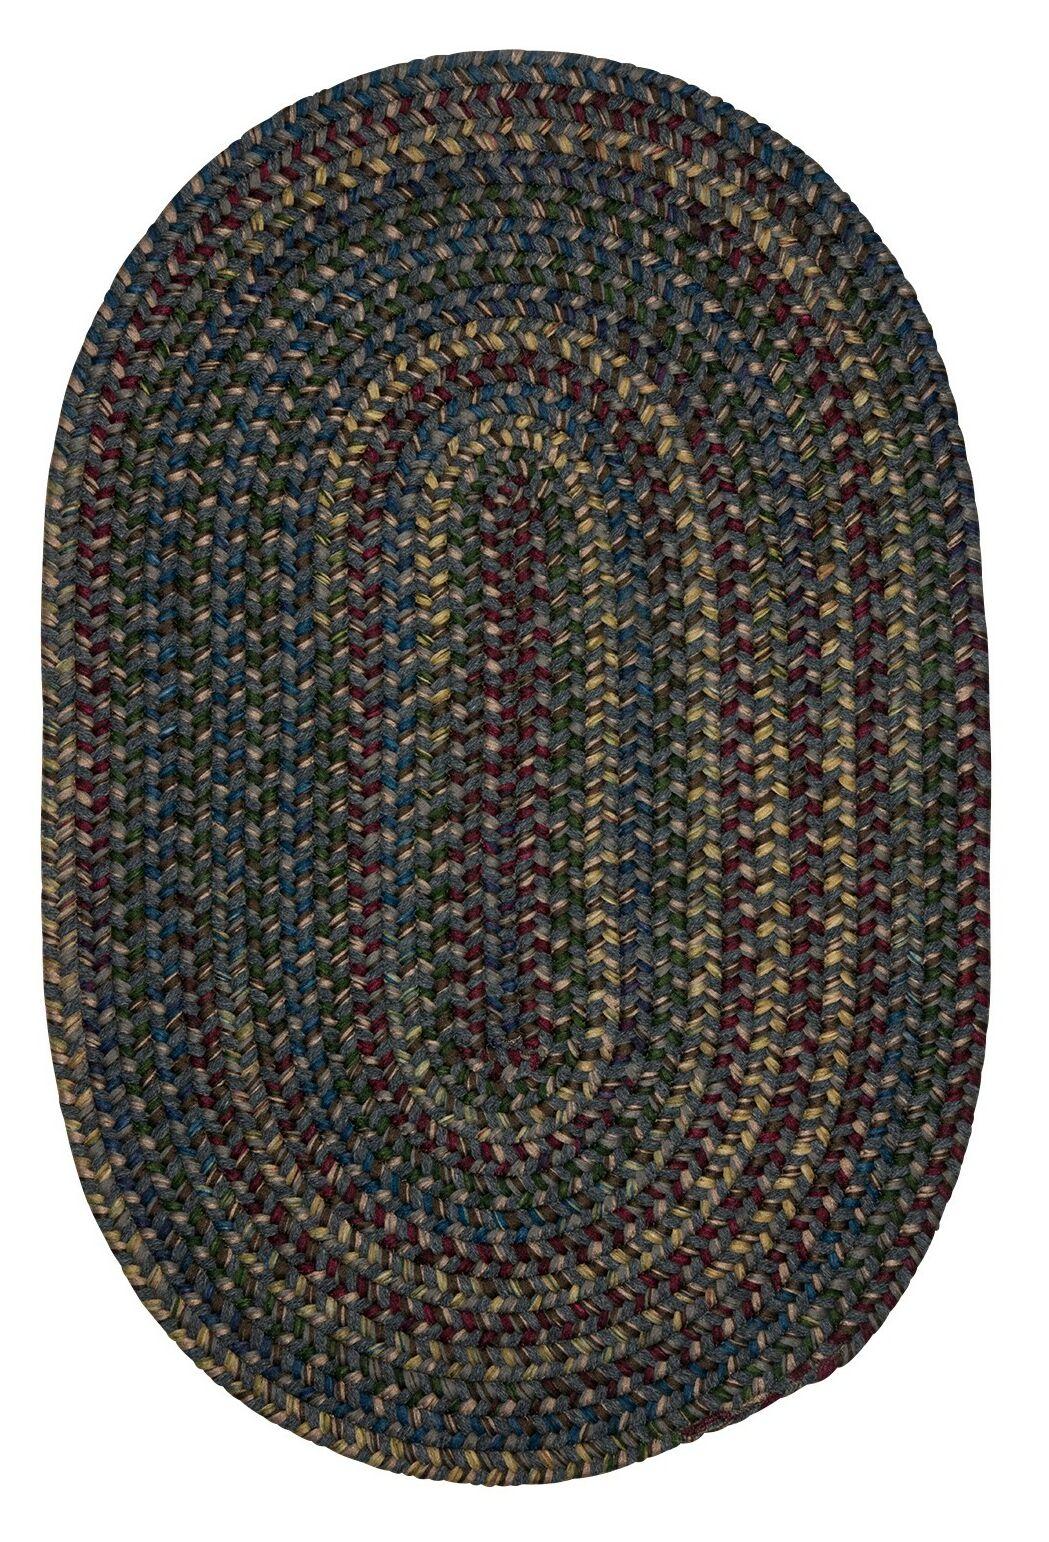 Lippold Charcoal Area Rug Rug Size: Oval 2' x 10'